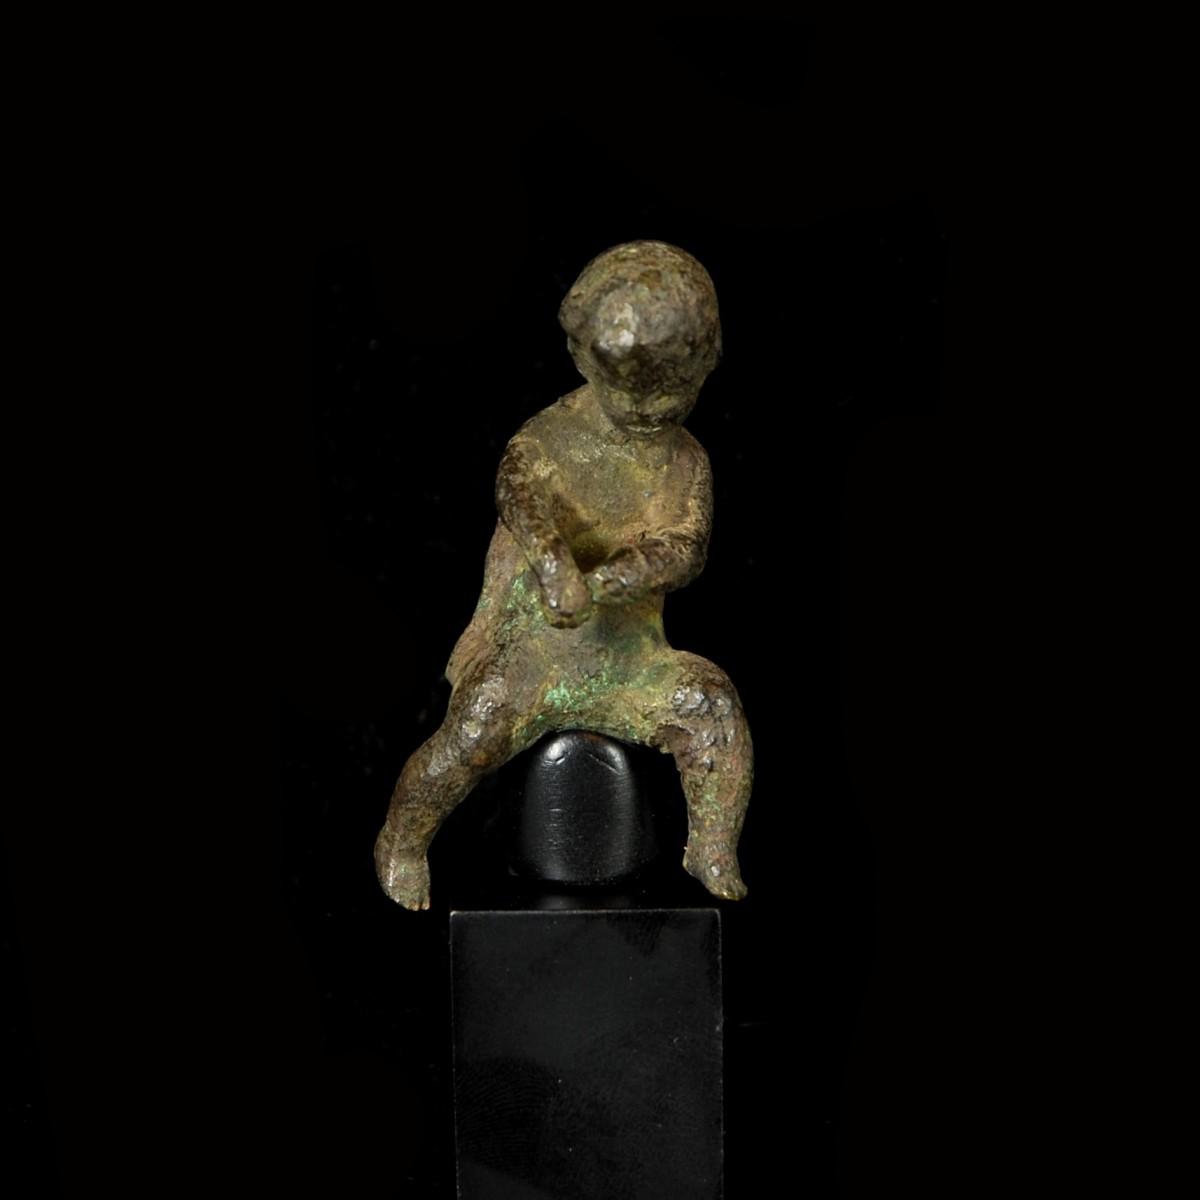 Riding amor statuette